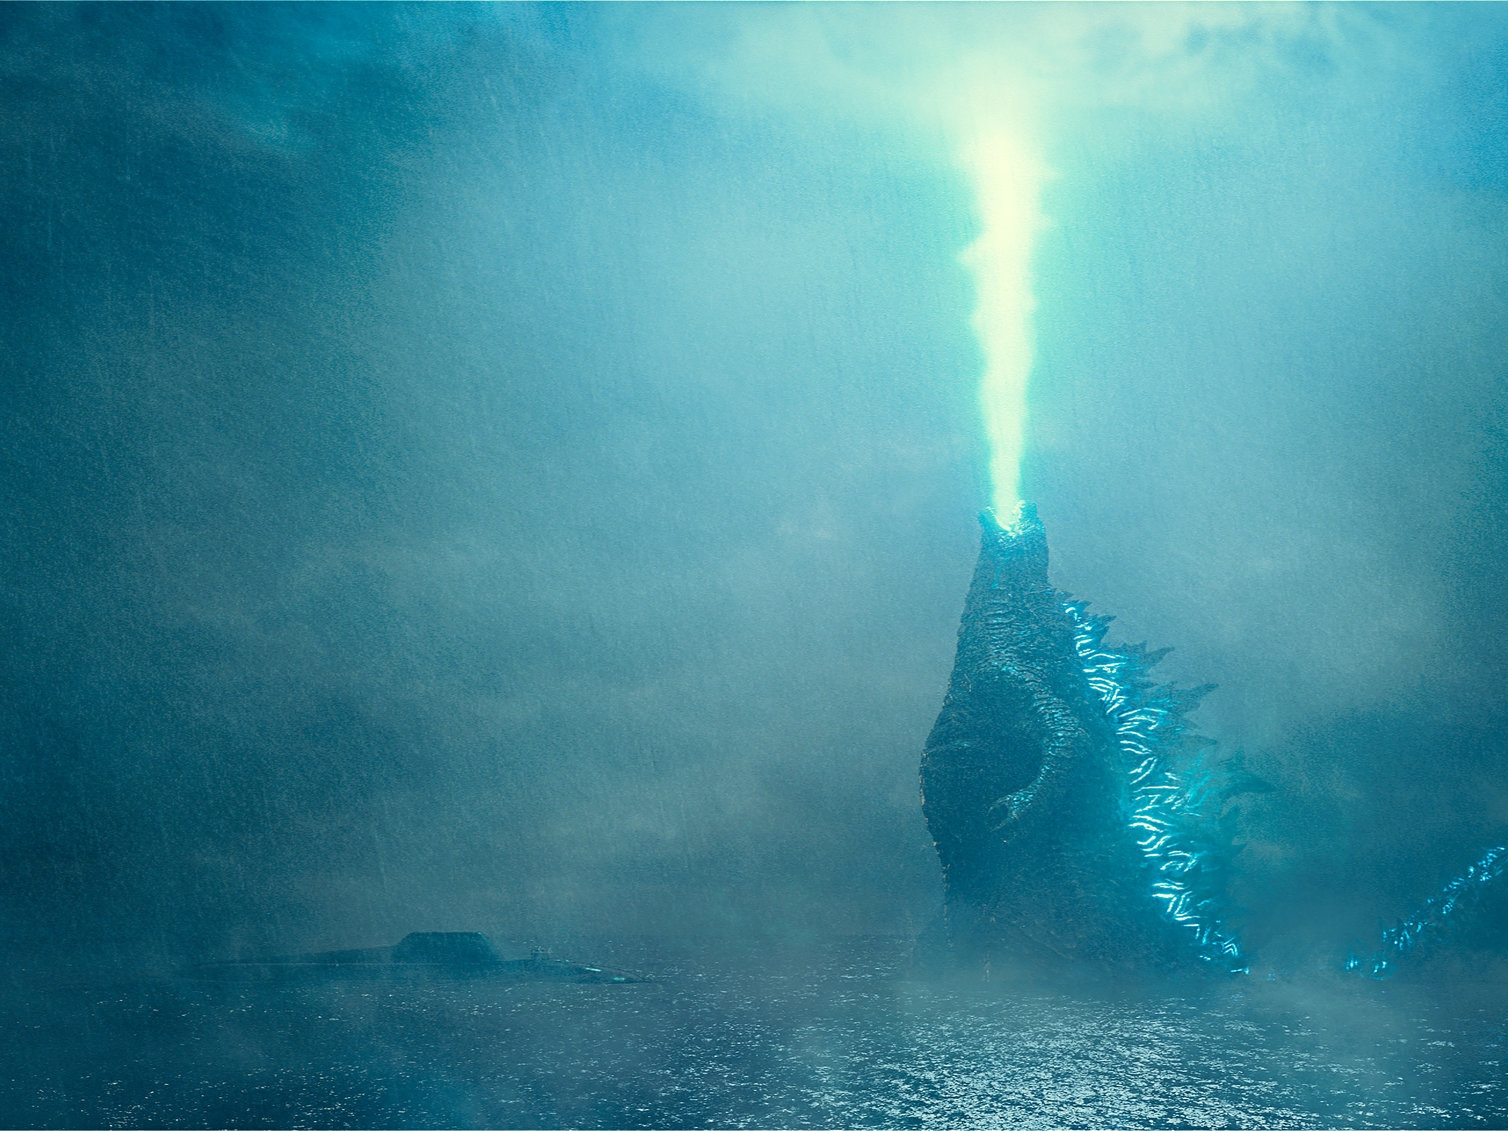 Burning it off on the Godzilla diet.